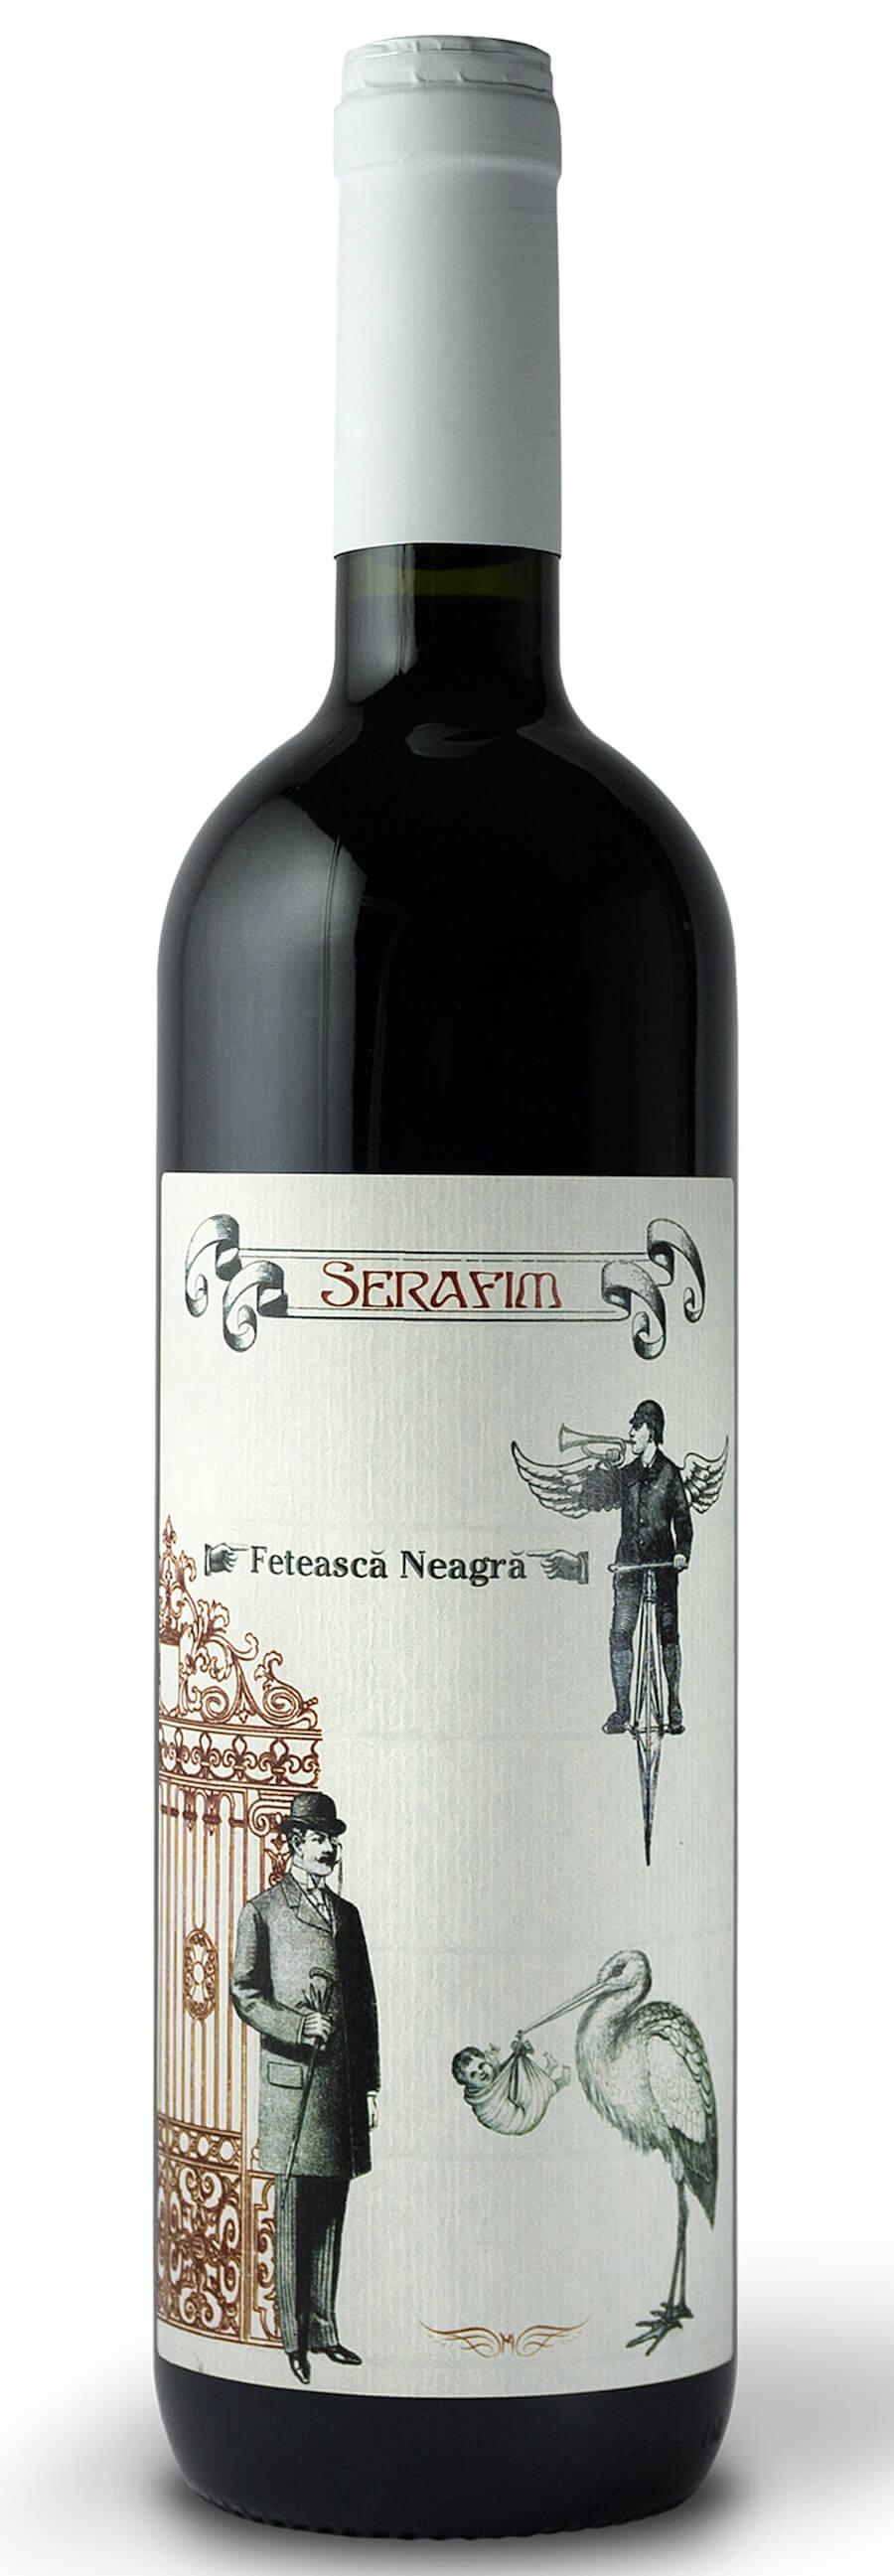 Serafim Feteasca Neagra Licorna Winehouse